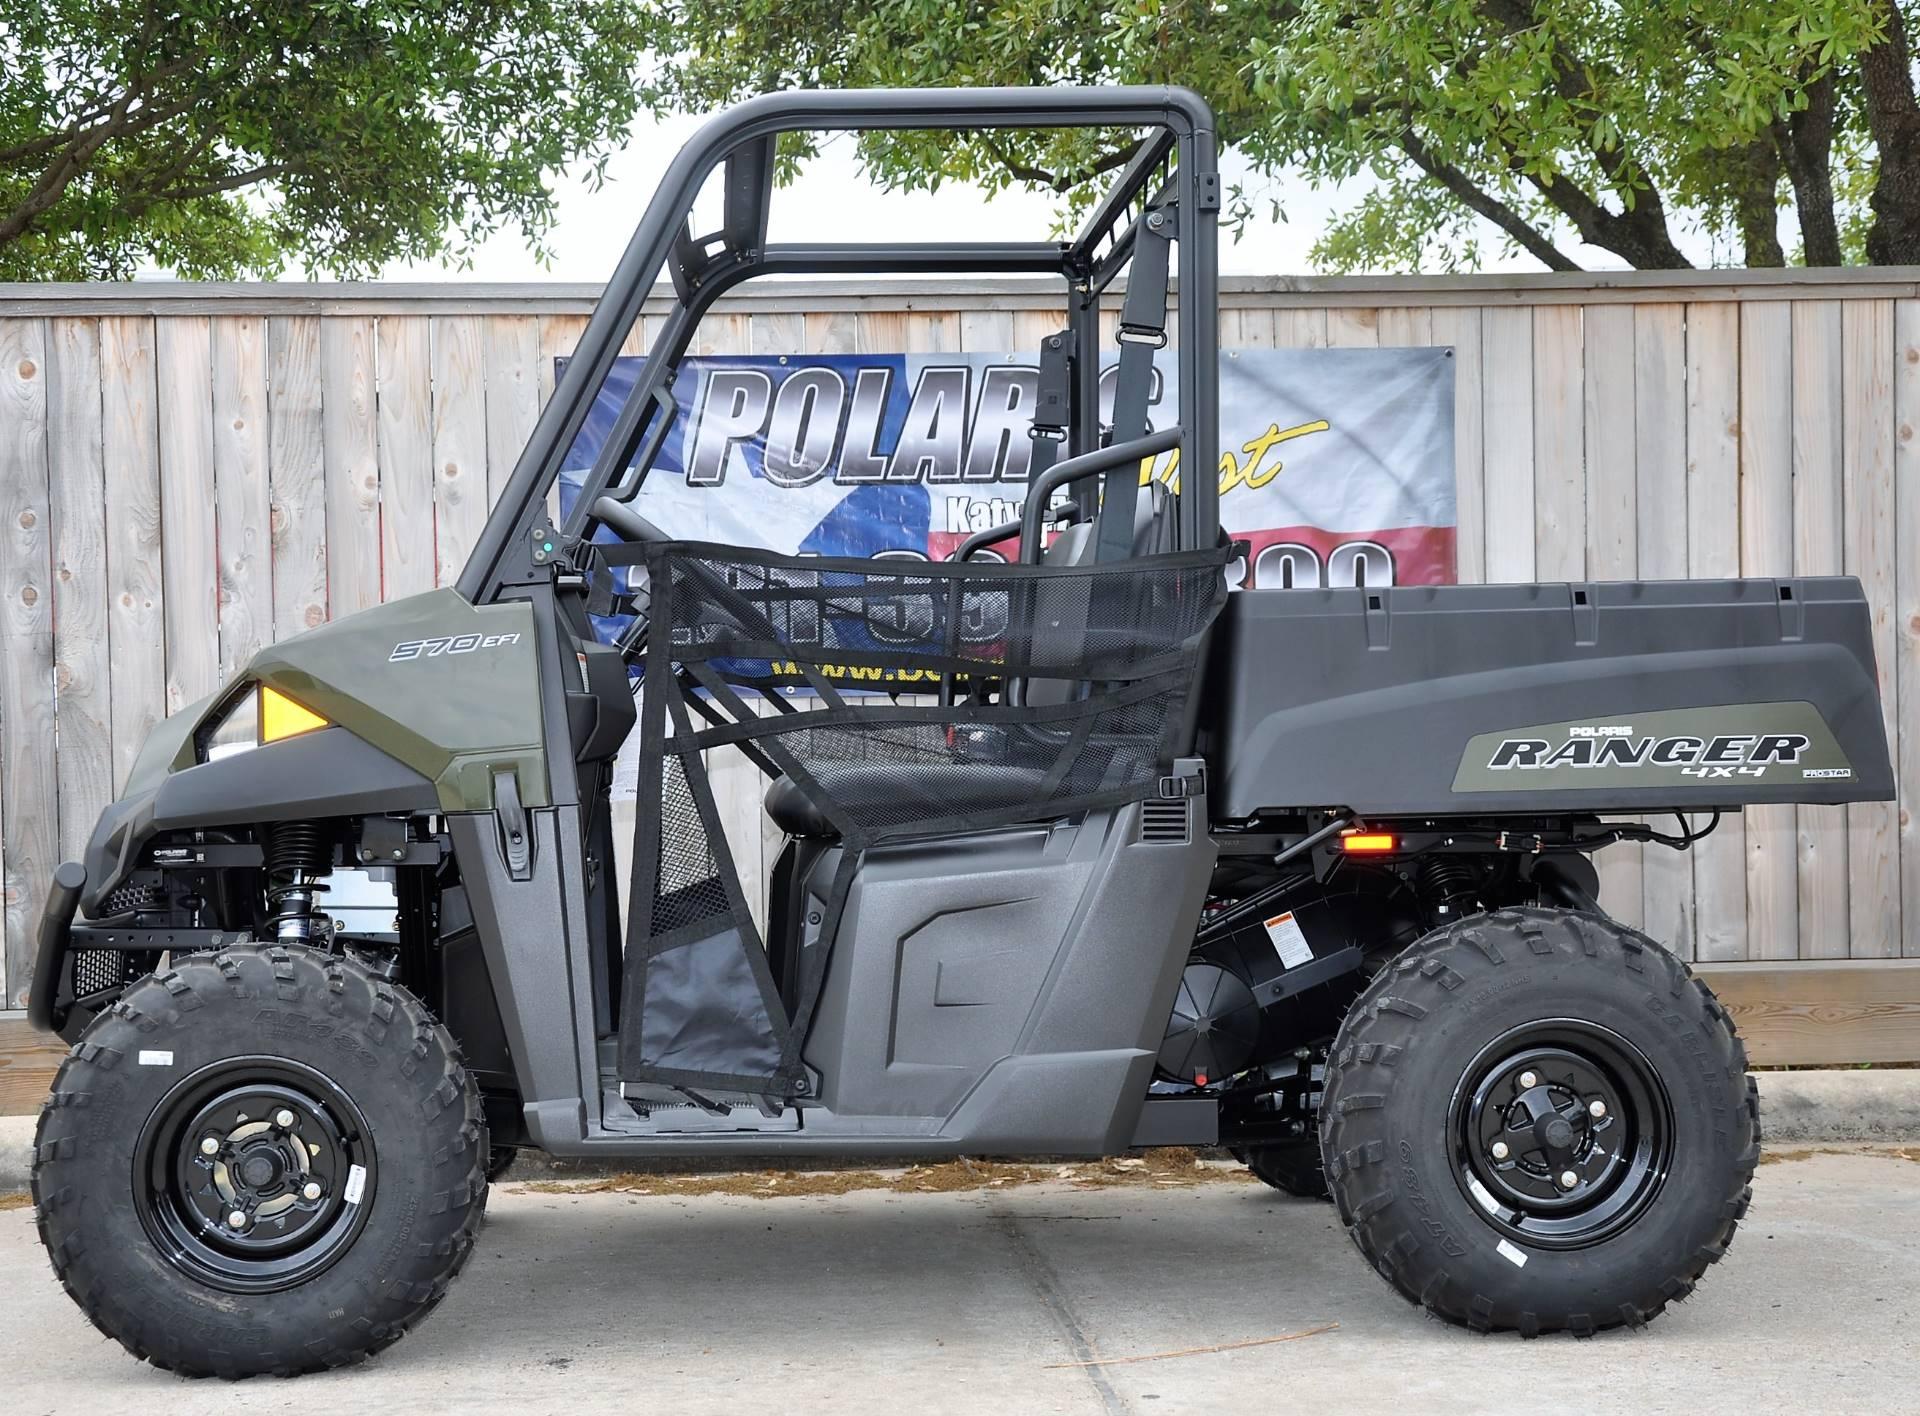 Polaris Ranger 570 >> 2019 Polaris Ranger 570 In Katy Texas